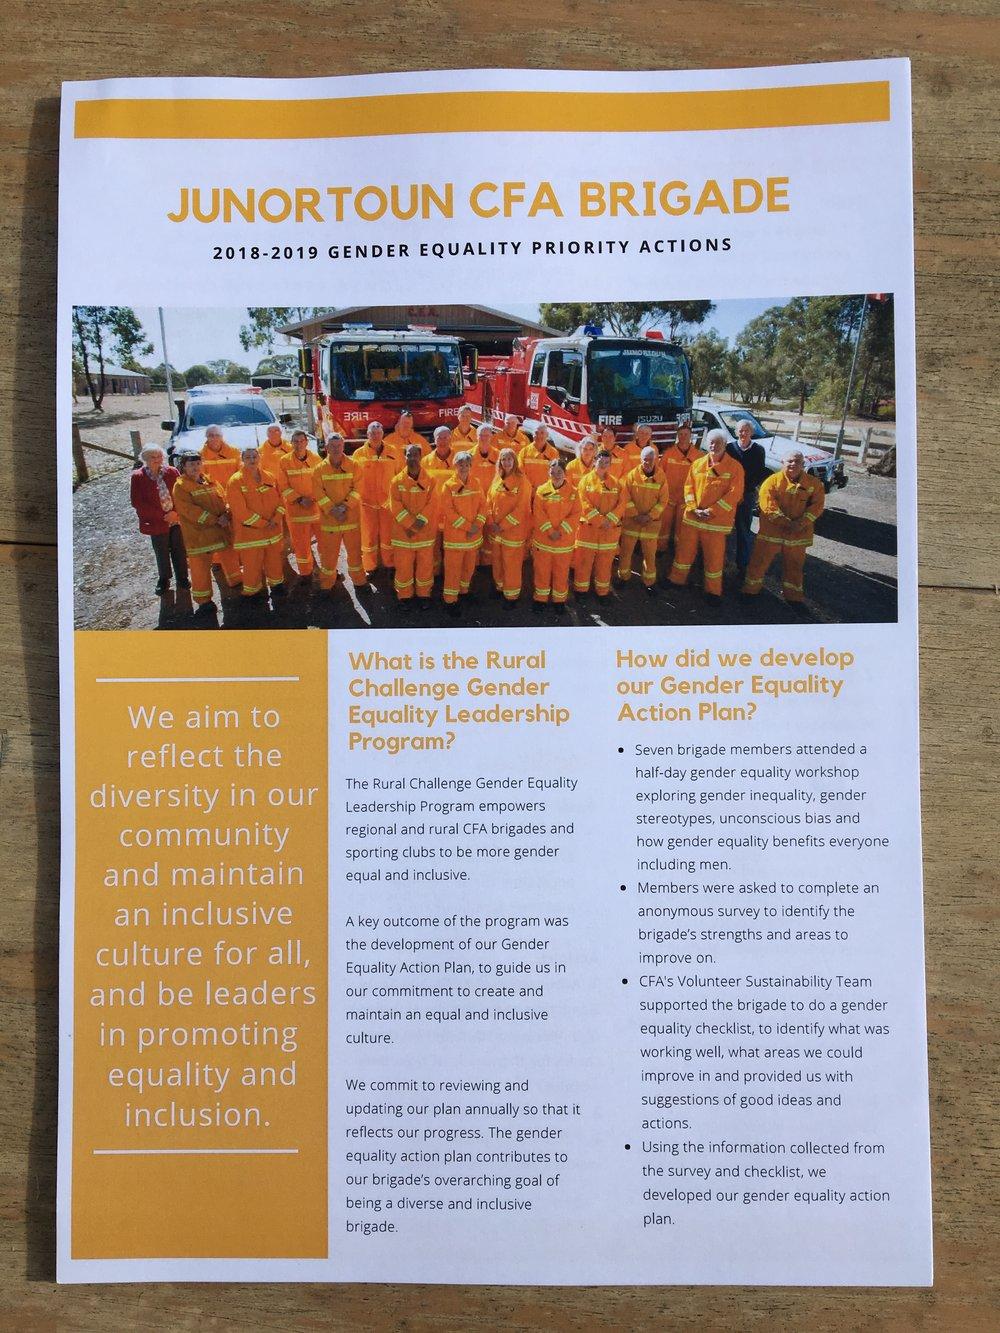 Junortoun CFA Brigade's Gender Equality Action Plan Goal